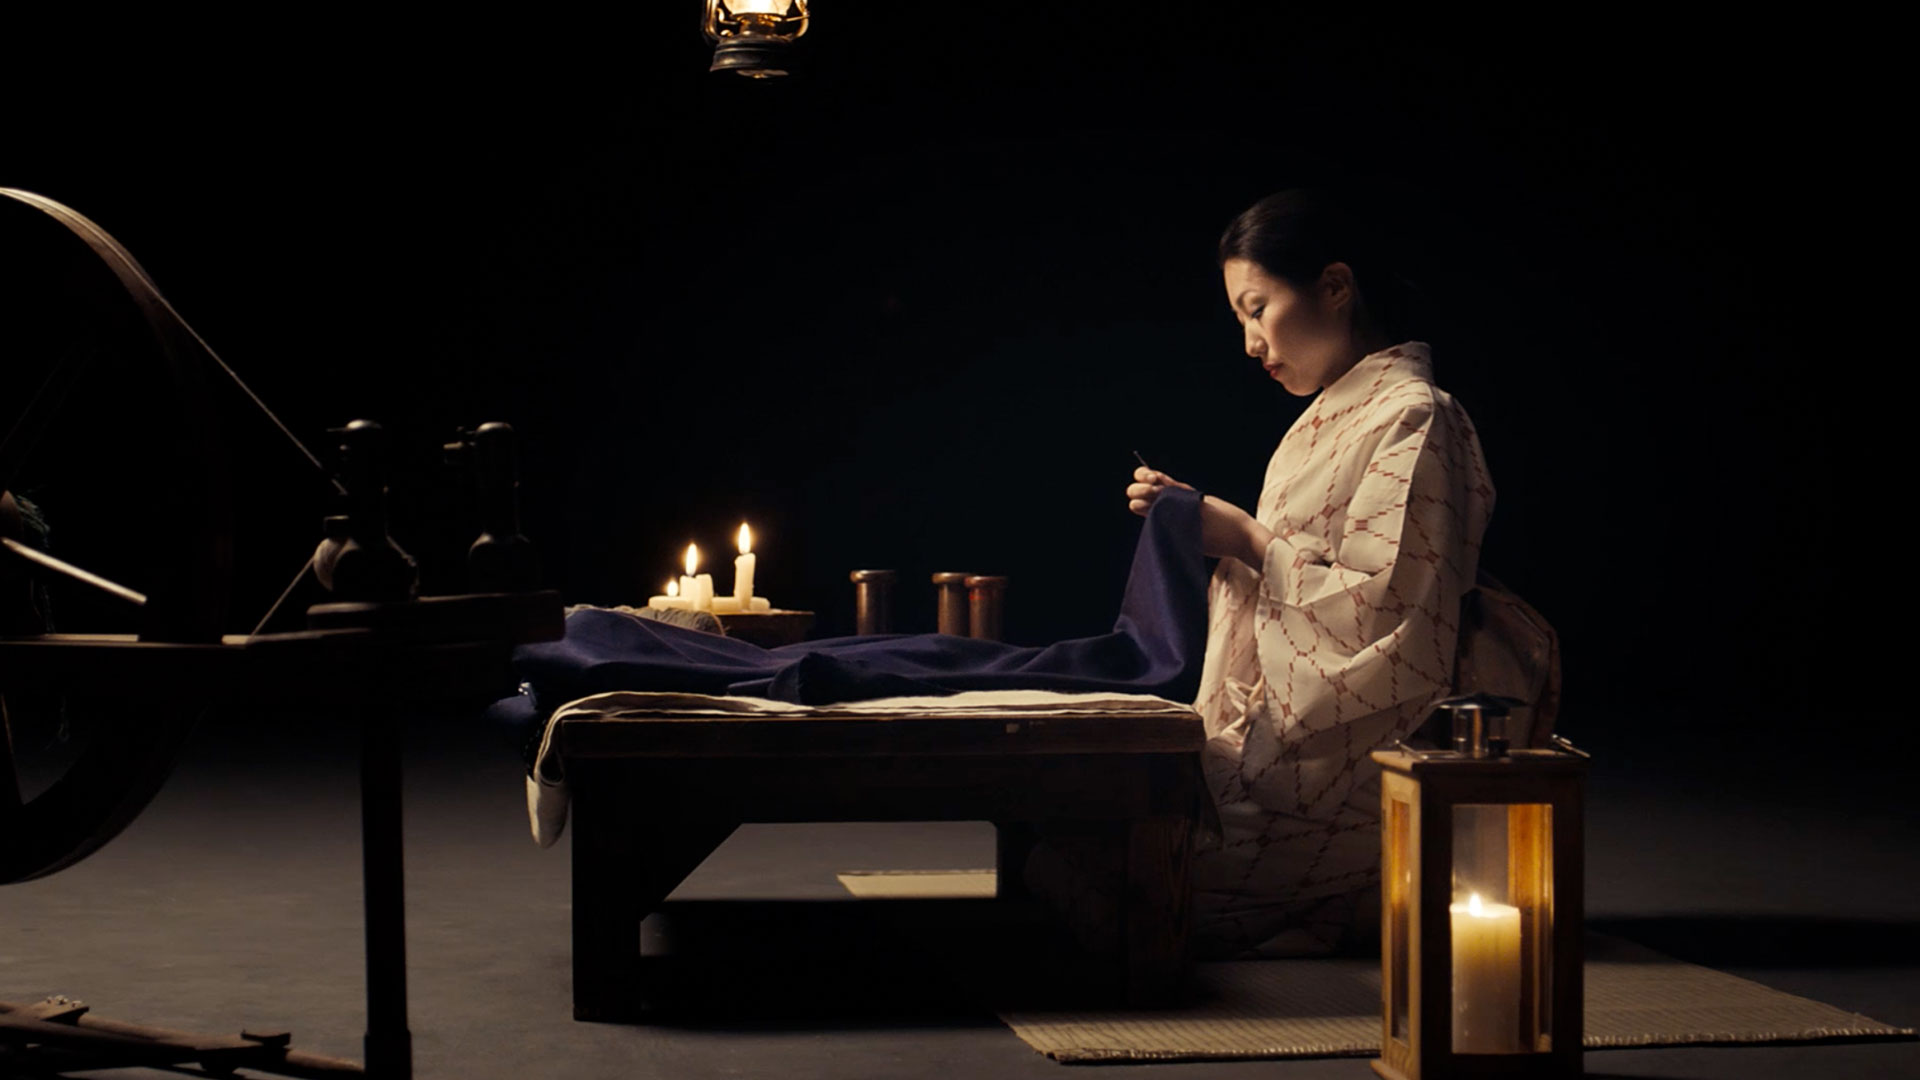 Lexus UX Frau in Kimono